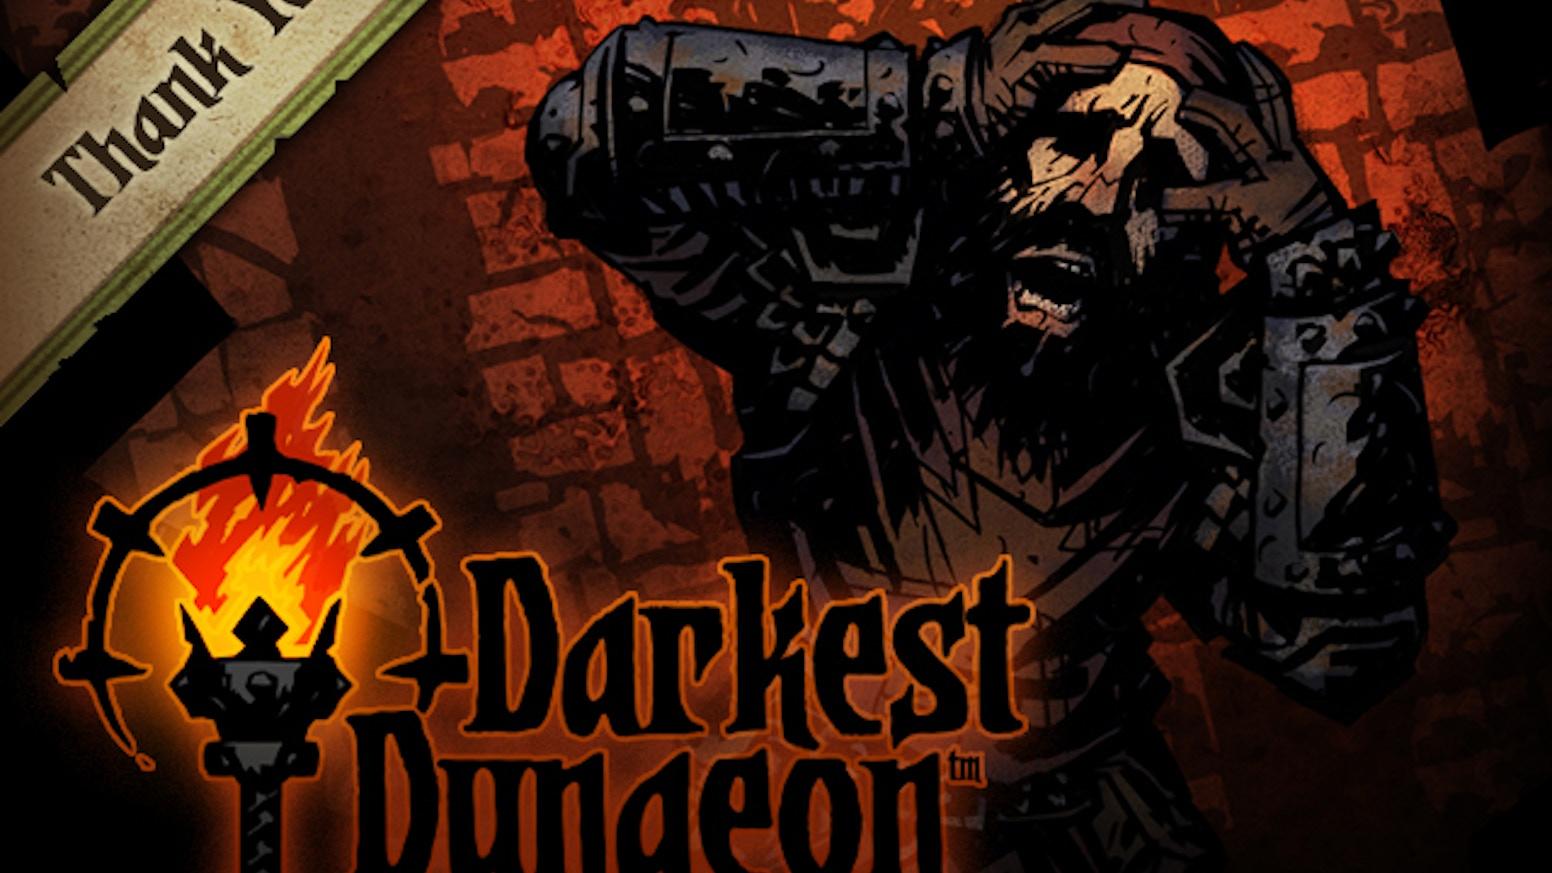 Line # Characters/DarkestDungeonTheHamlet - TV Tropes